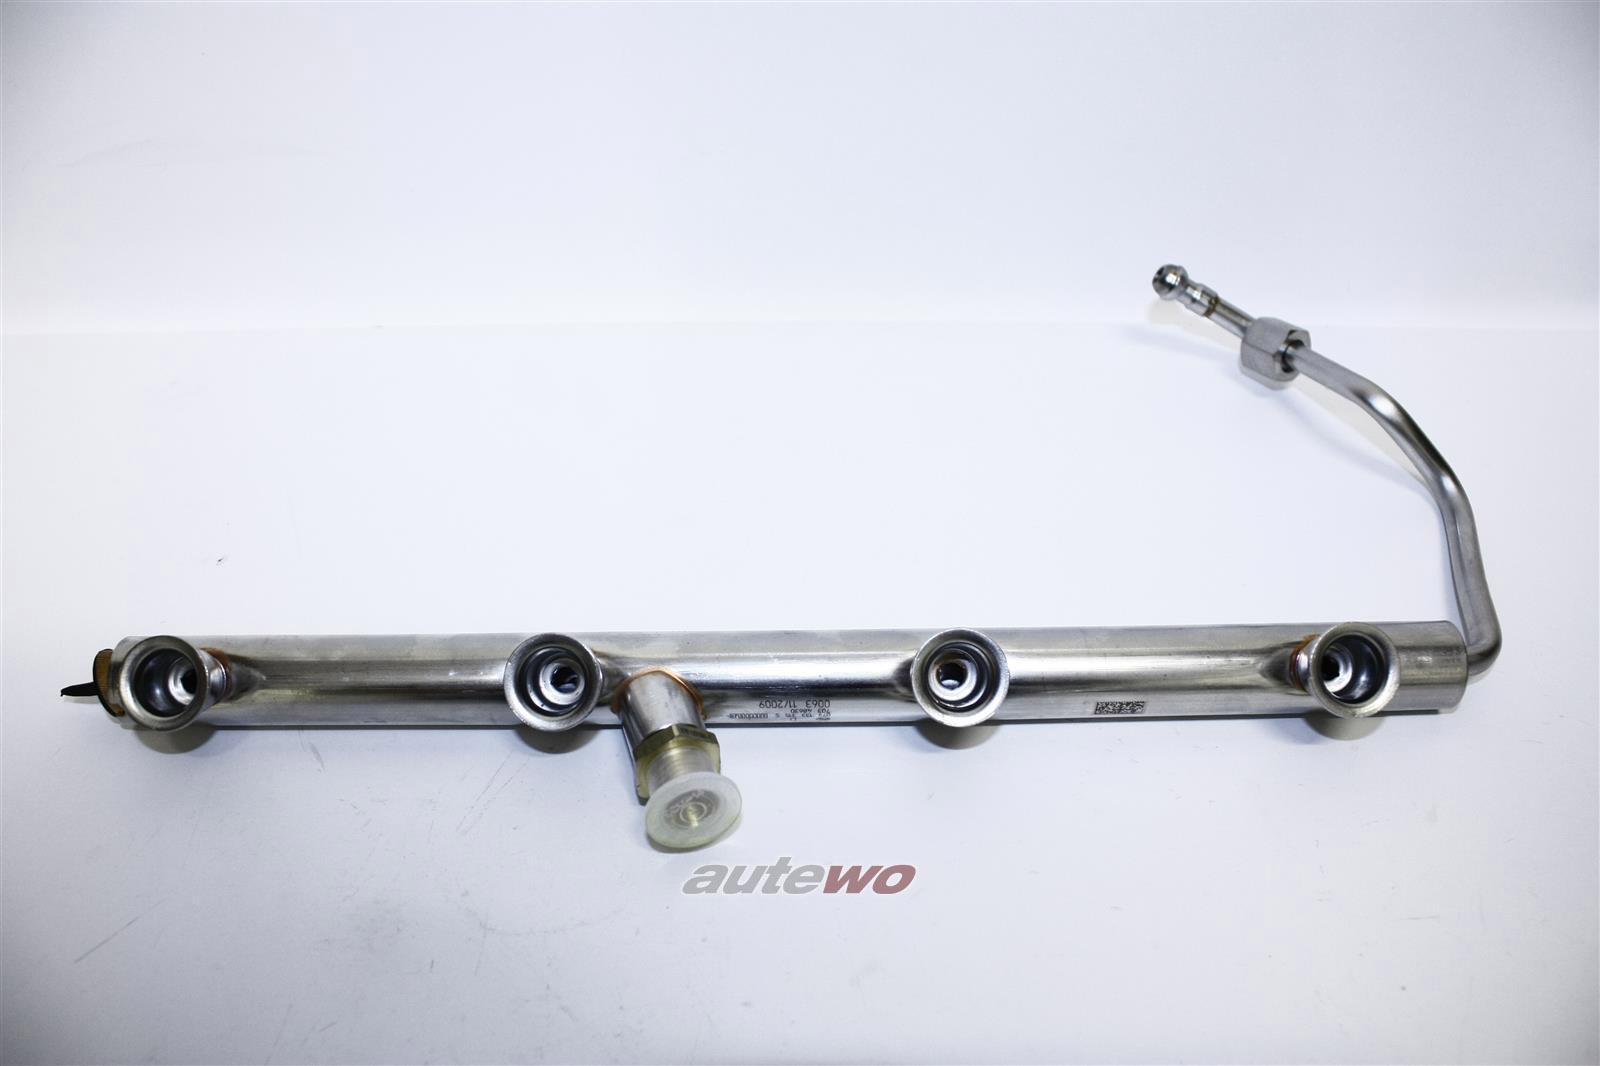 079133315S NEU Audi/VW A5/S5 8T/A6/S6 4F/A8 D3 4.2l Kraftstoffverteiler